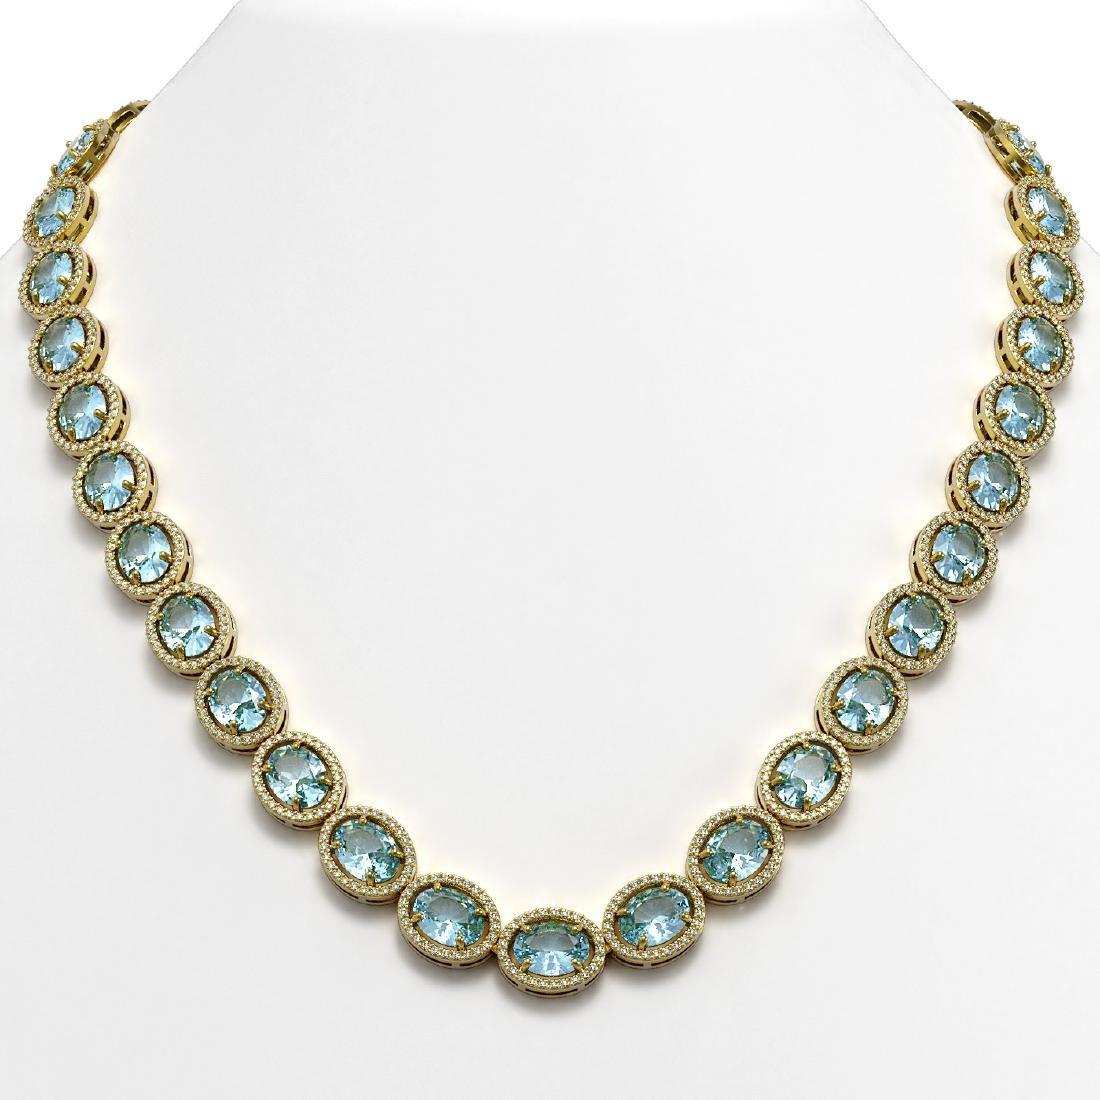 54.11 CTW Aquamarine & Diamond Halo Necklace 10K Yellow